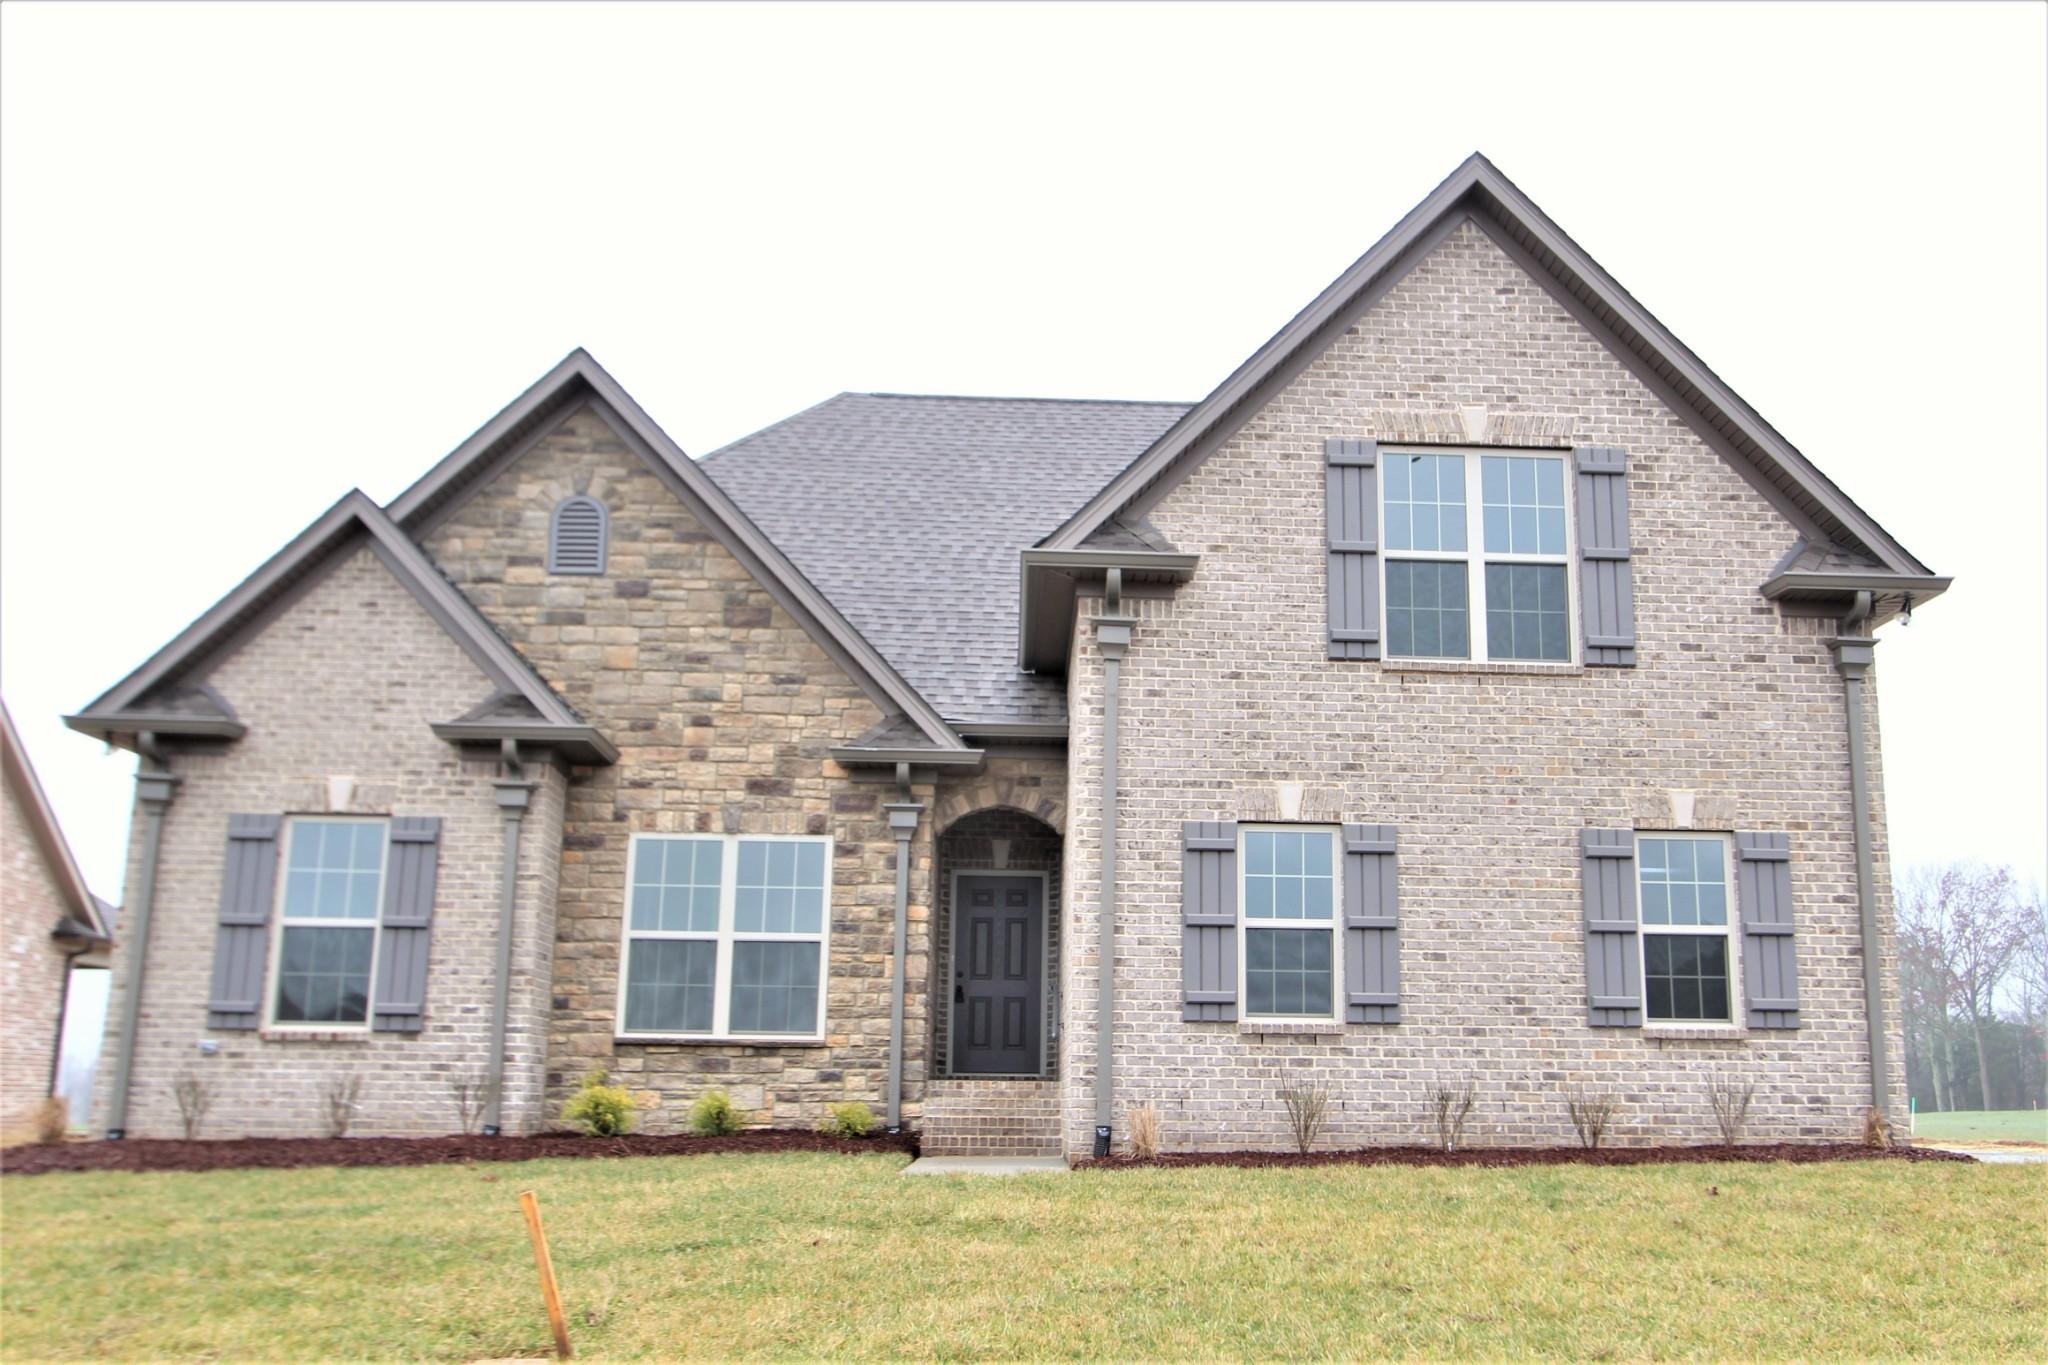 811 Jersey #32-C, Clarksville, TN 37043 - Clarksville, TN real estate listing